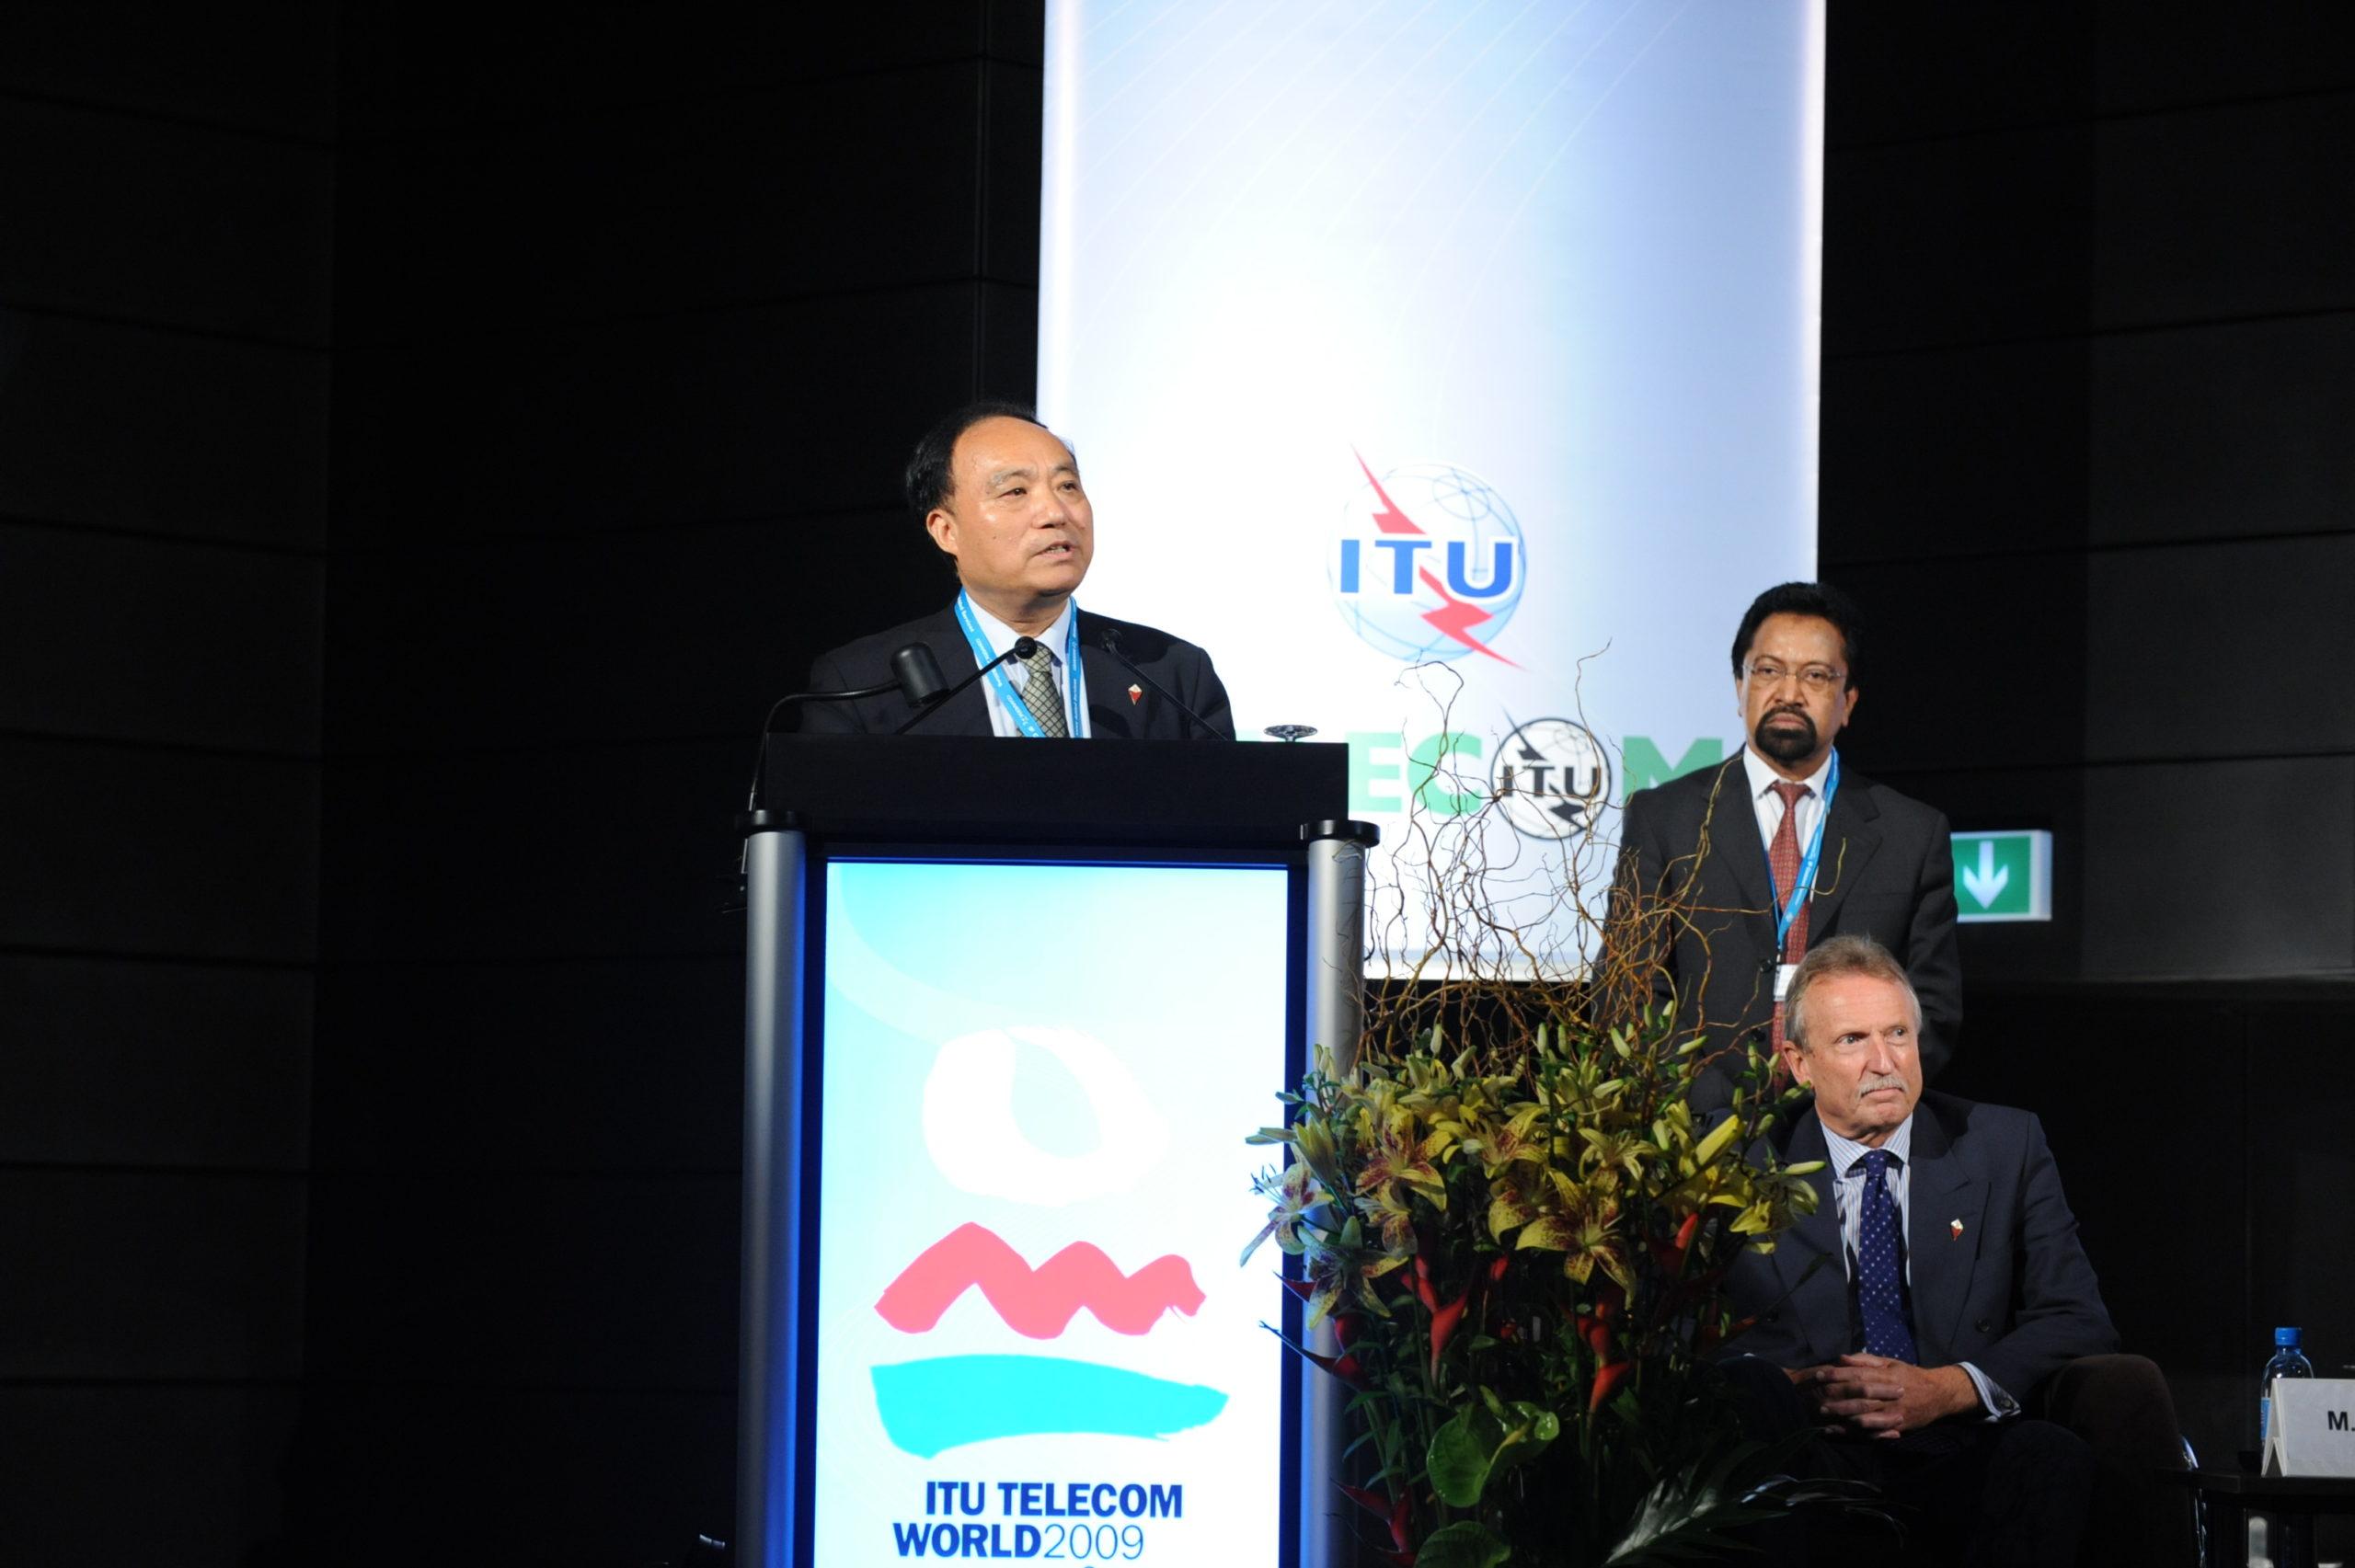 Geneva: Mr Houlin Zhao, Deputy Secretary General, speaking at ITU Telecom World 2009